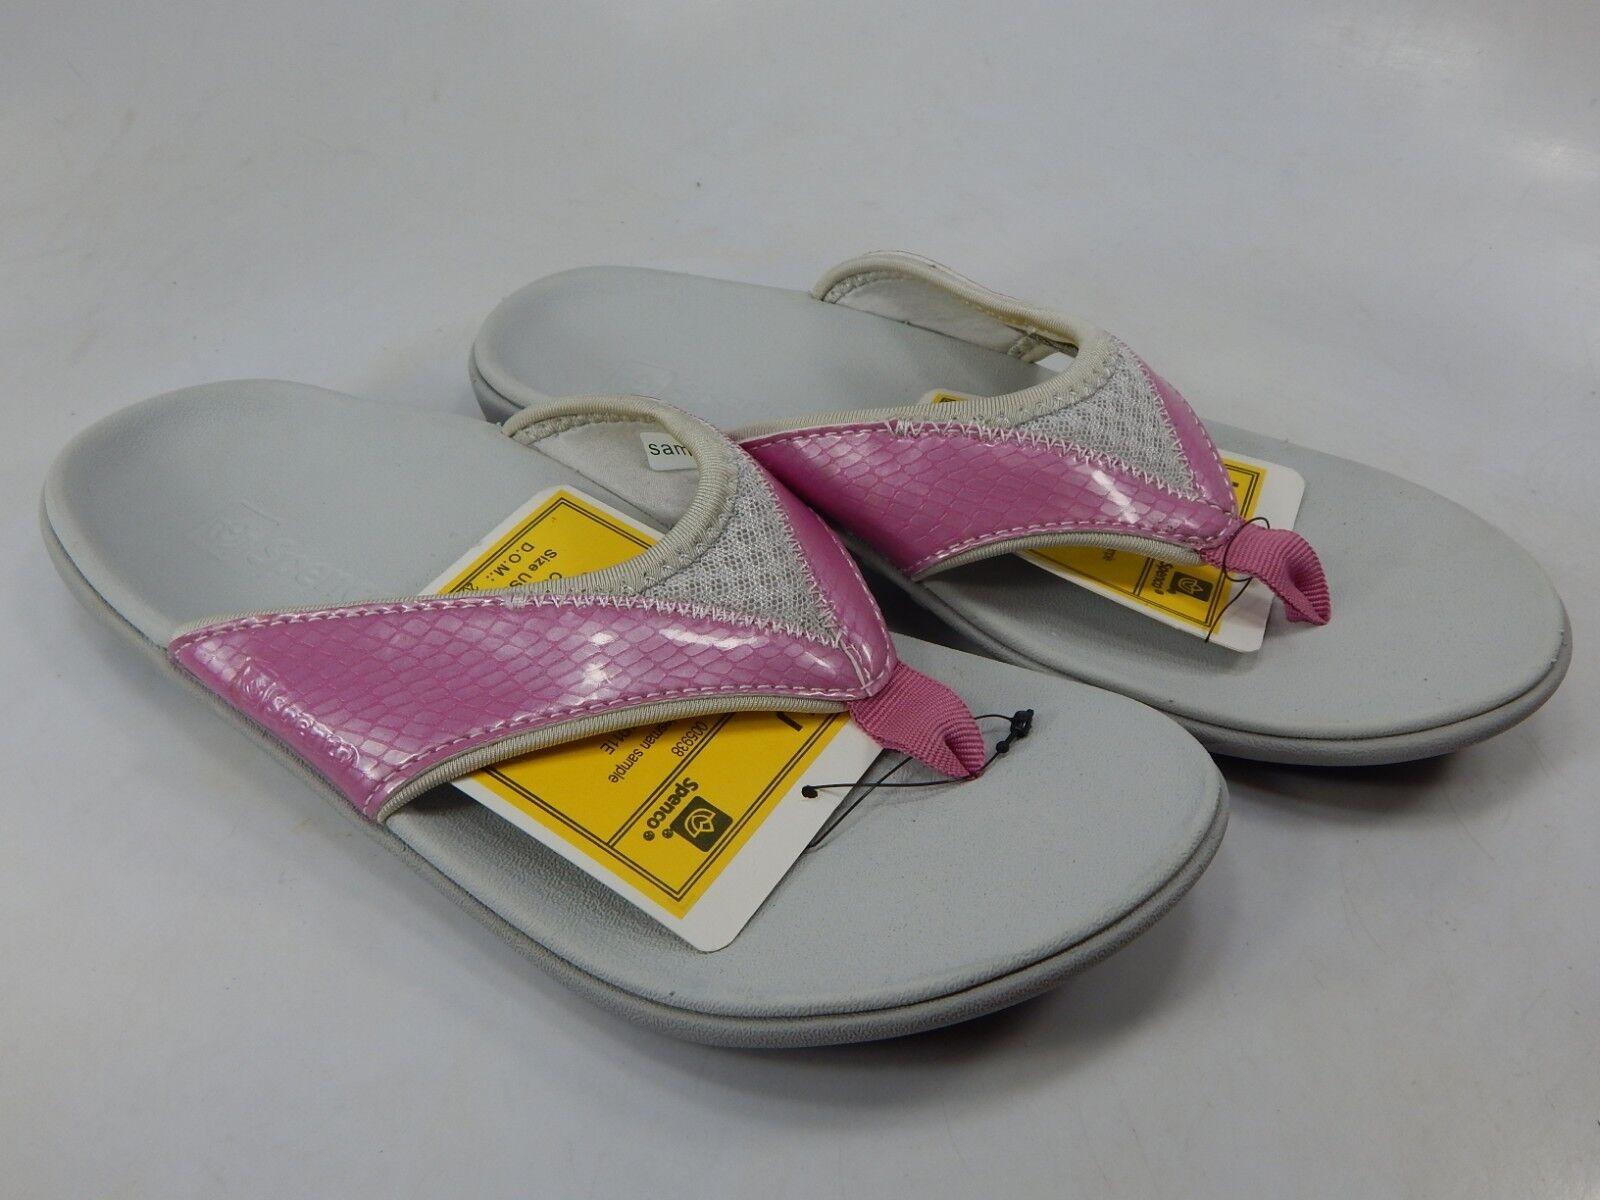 Spenco Sandi tamaño nos 7 M (B) EU 37.5 para para para mujer de recuperación Flip Flop Sandalias rosado  comprar descuentos